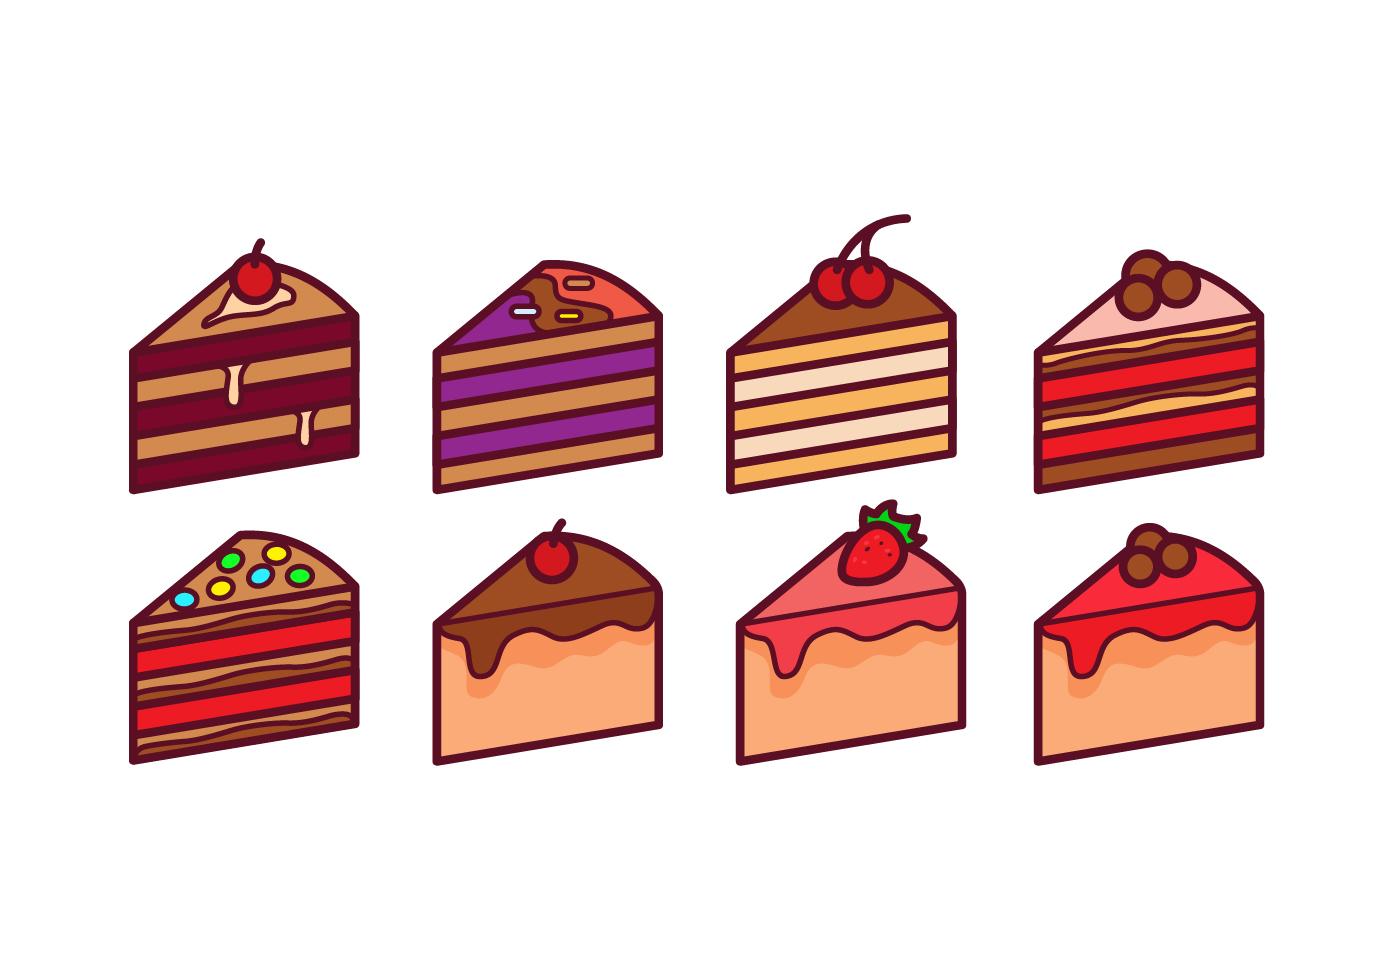 Cake Slice Vector Pack Download Free Vector Art Stock